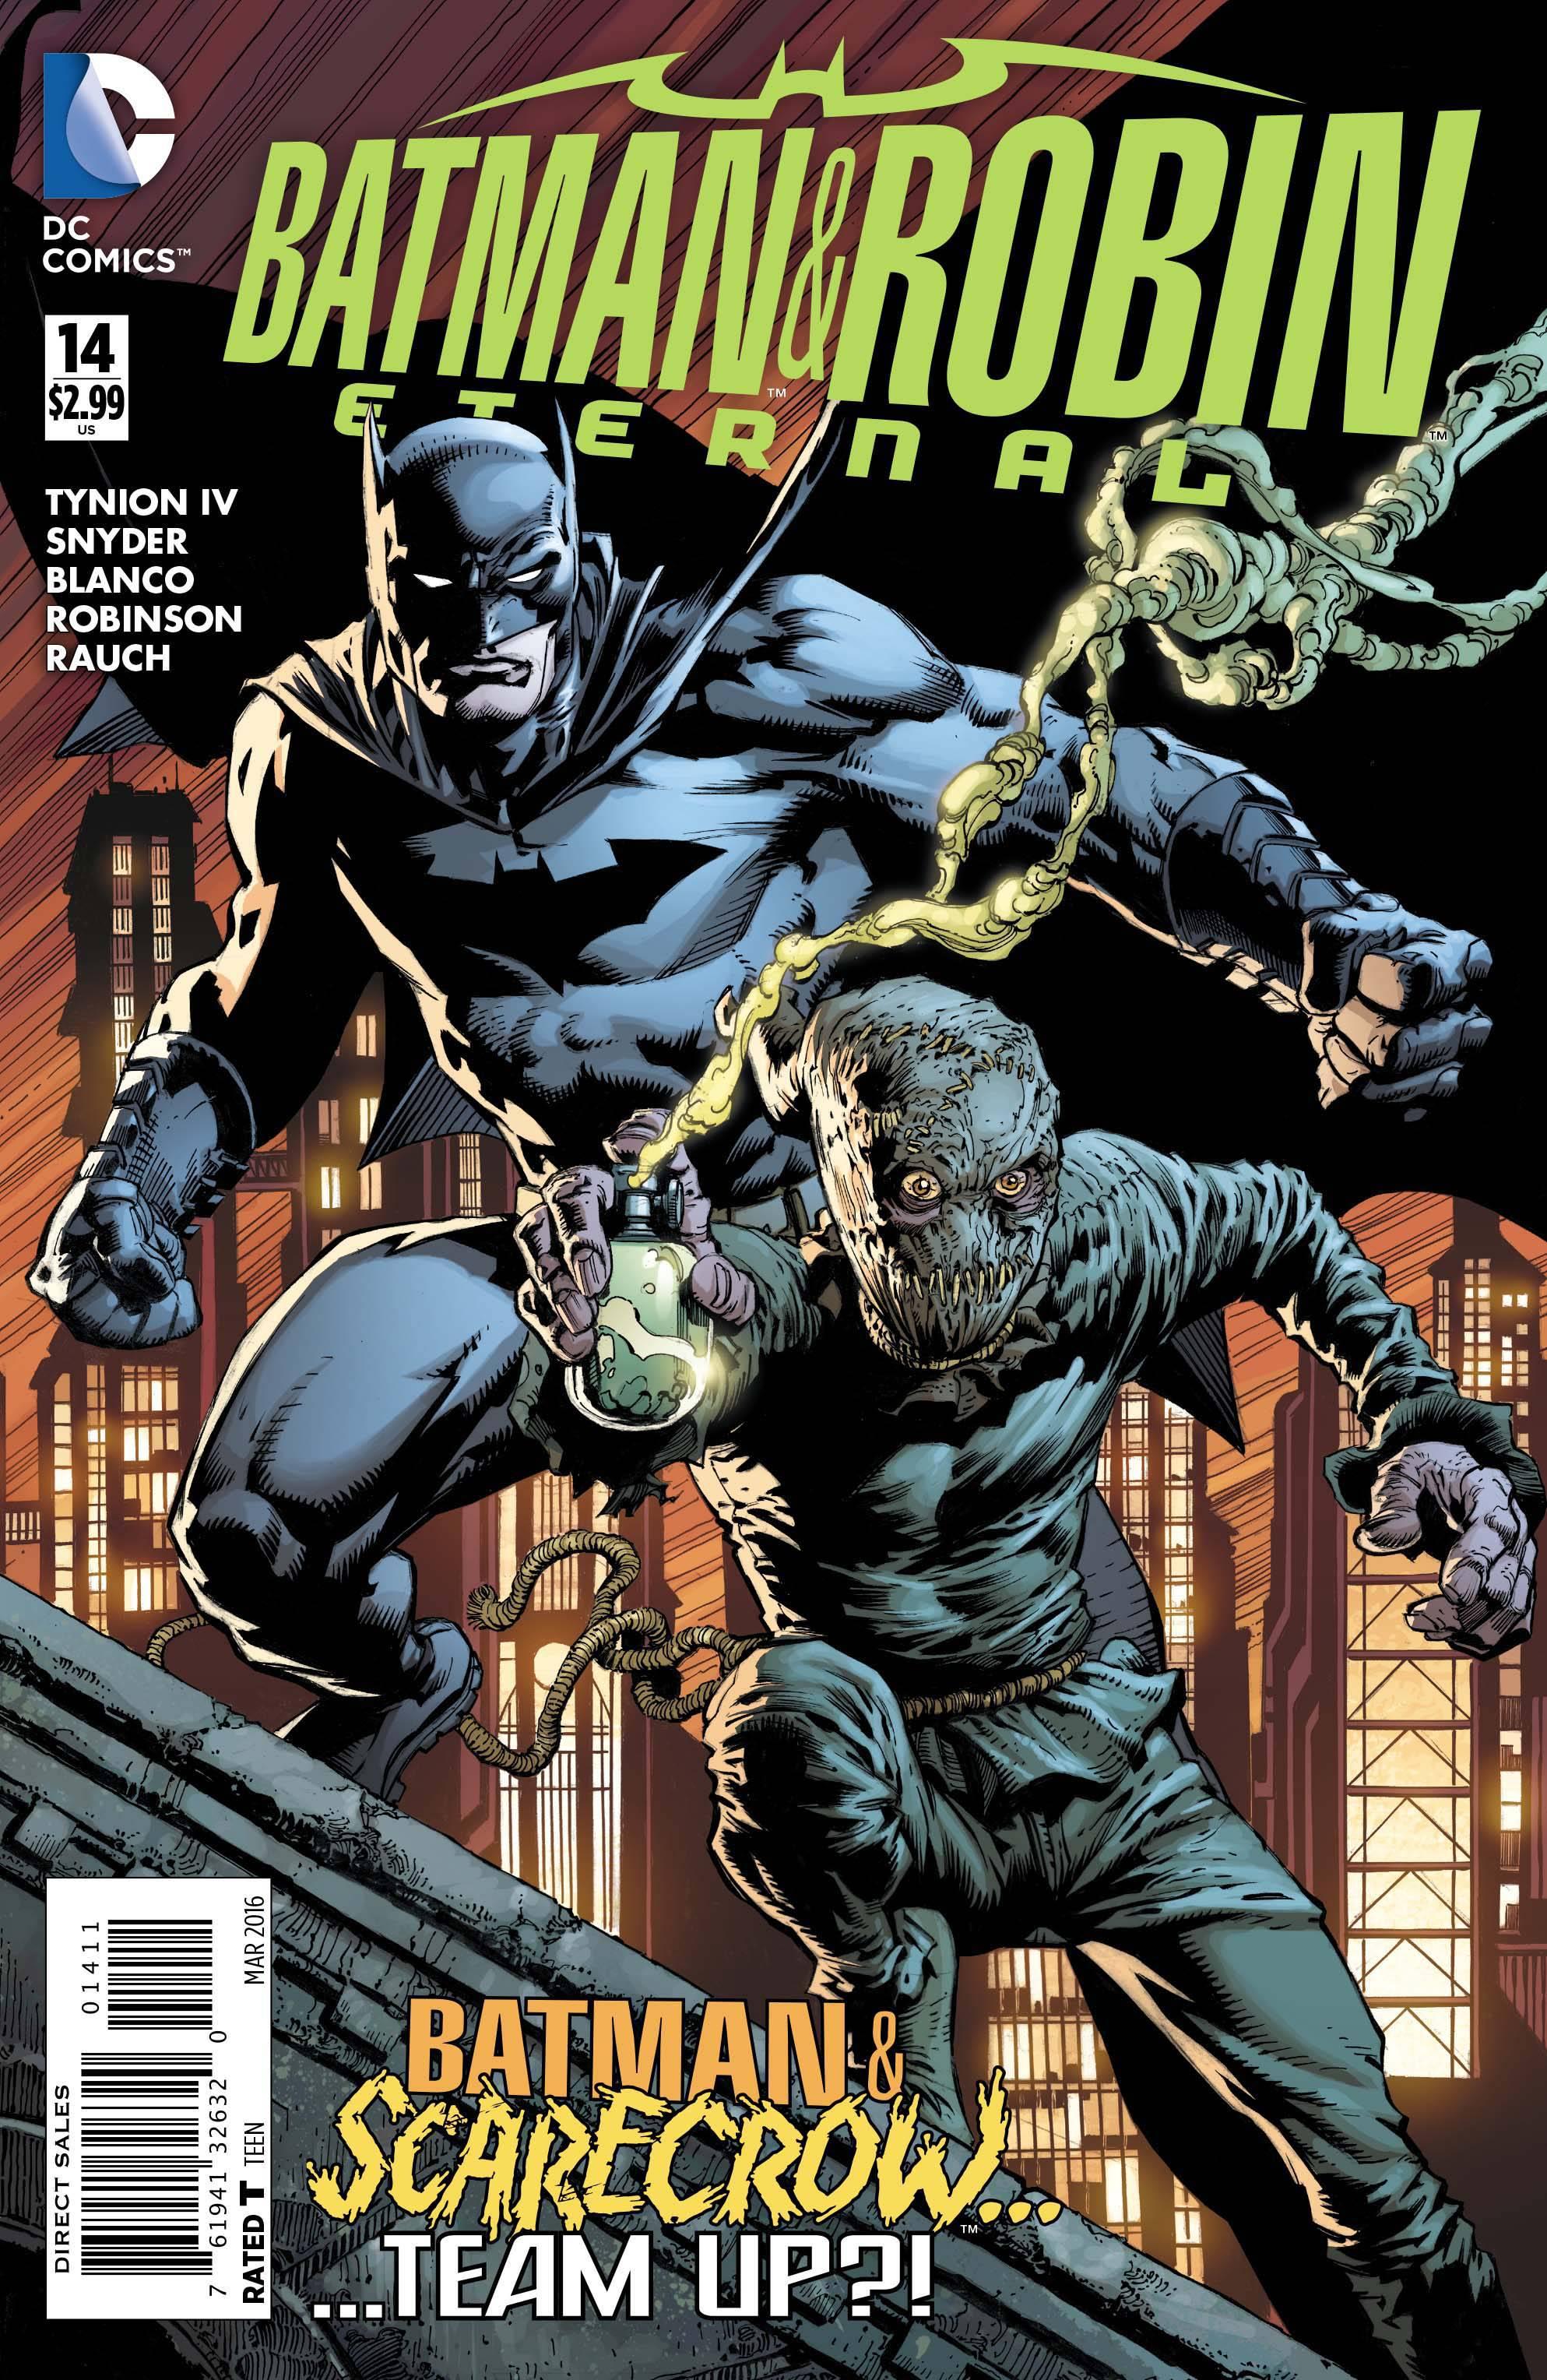 BATMAN AND ROBIN: ETERNAL #14